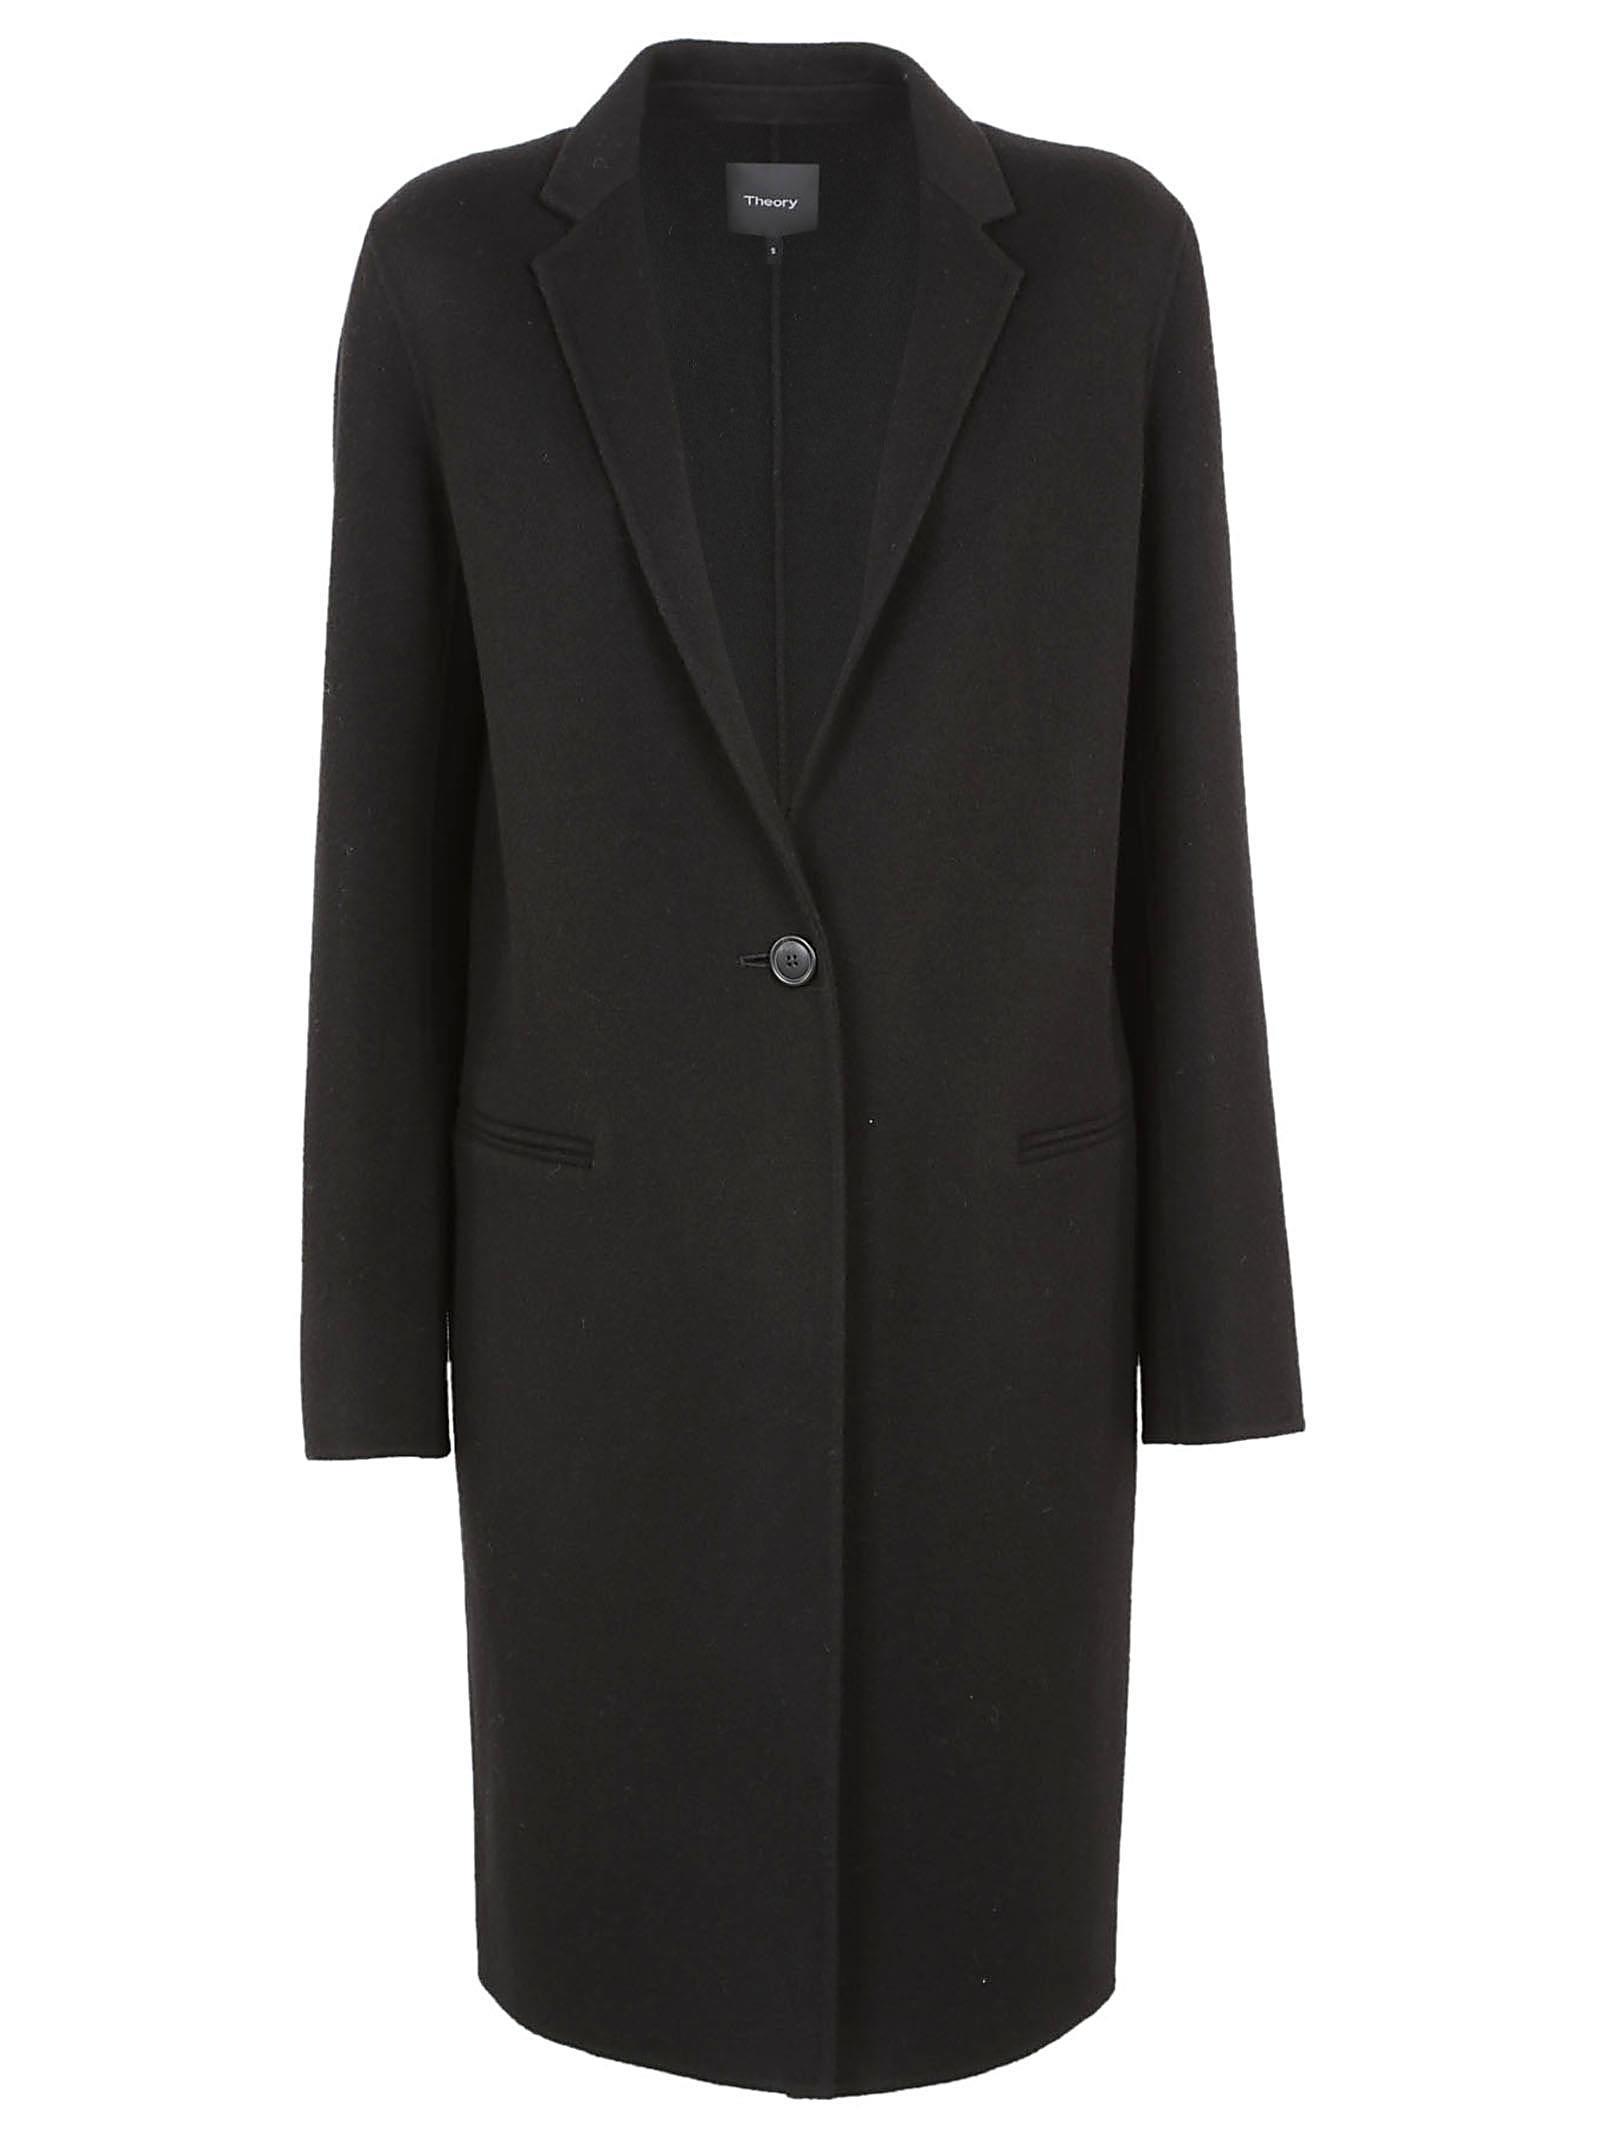 Theory Classic Long Coat